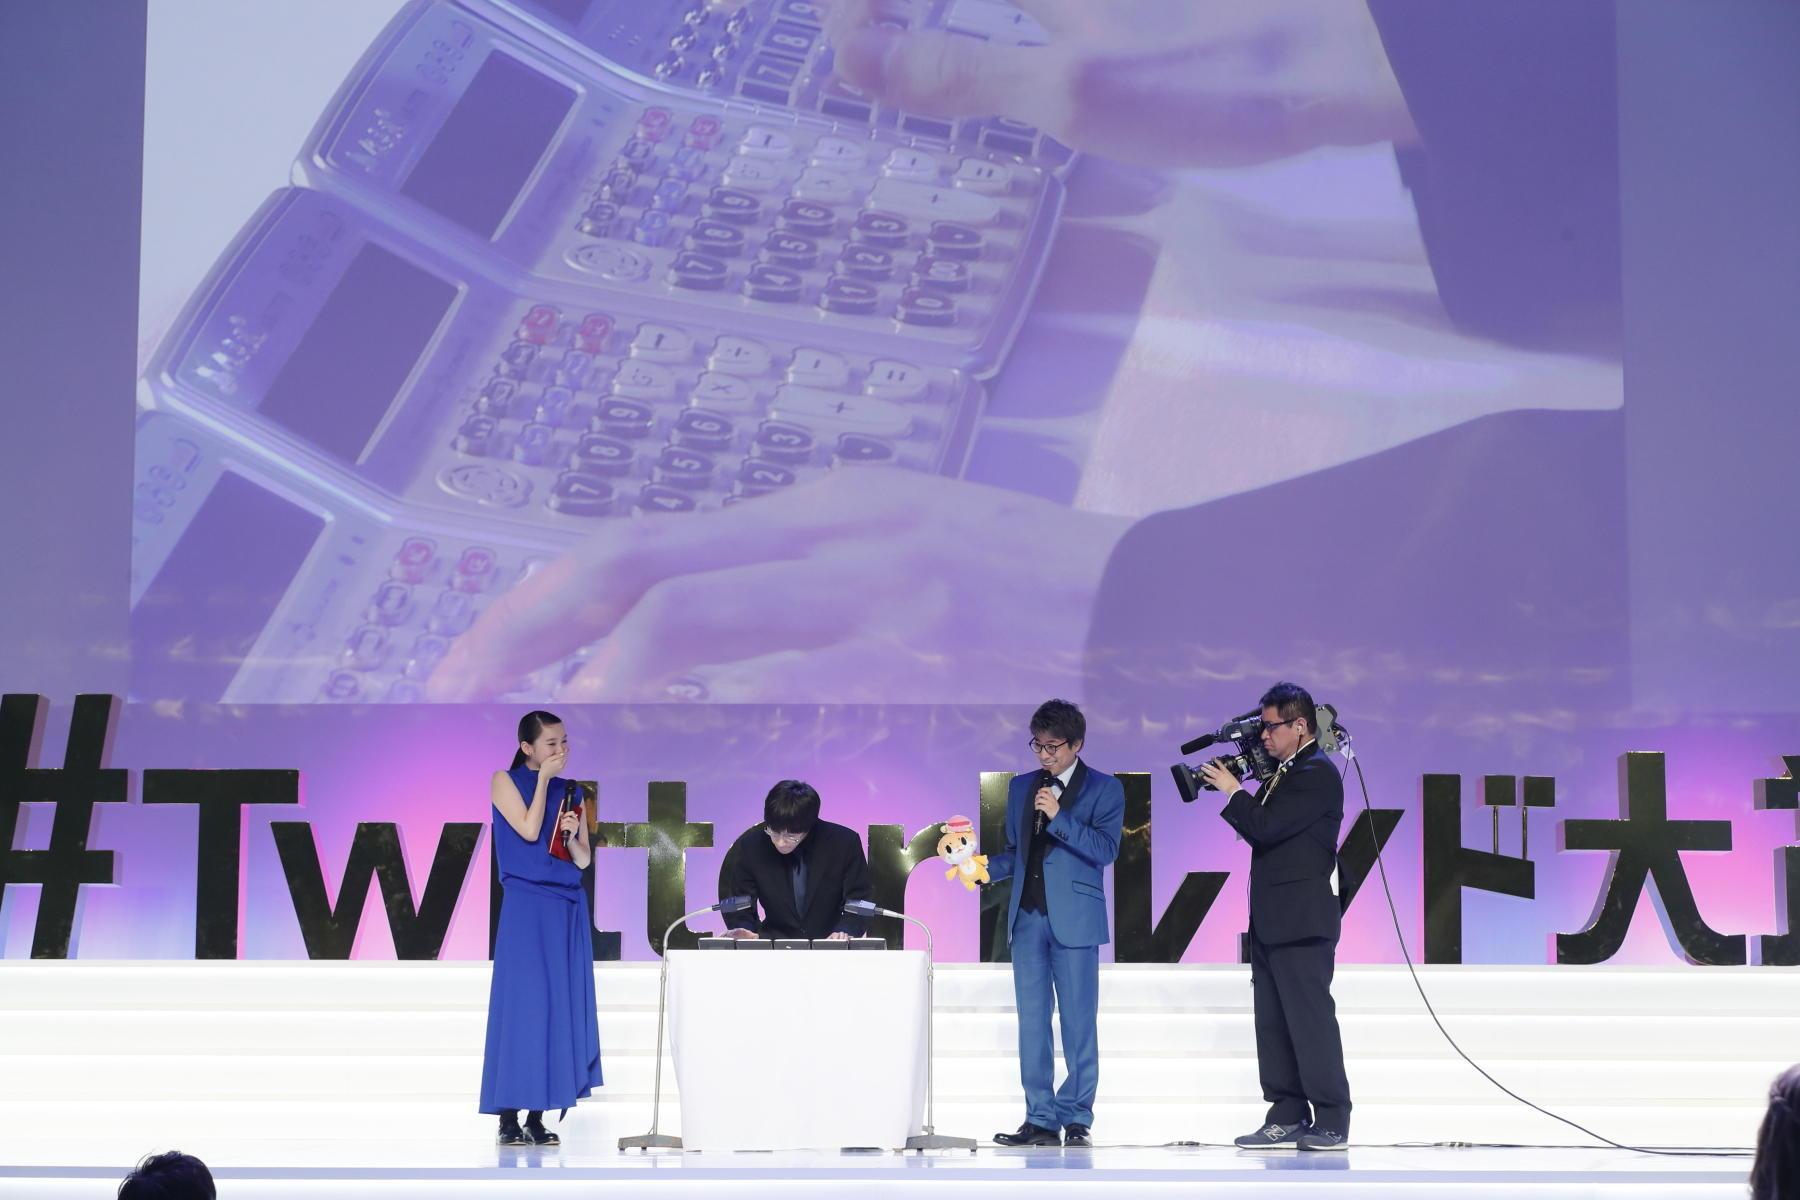 http://news.yoshimoto.co.jp/20190122014521-aa85e95e381824336f3de7b411a7c79a54e753ff.jpg